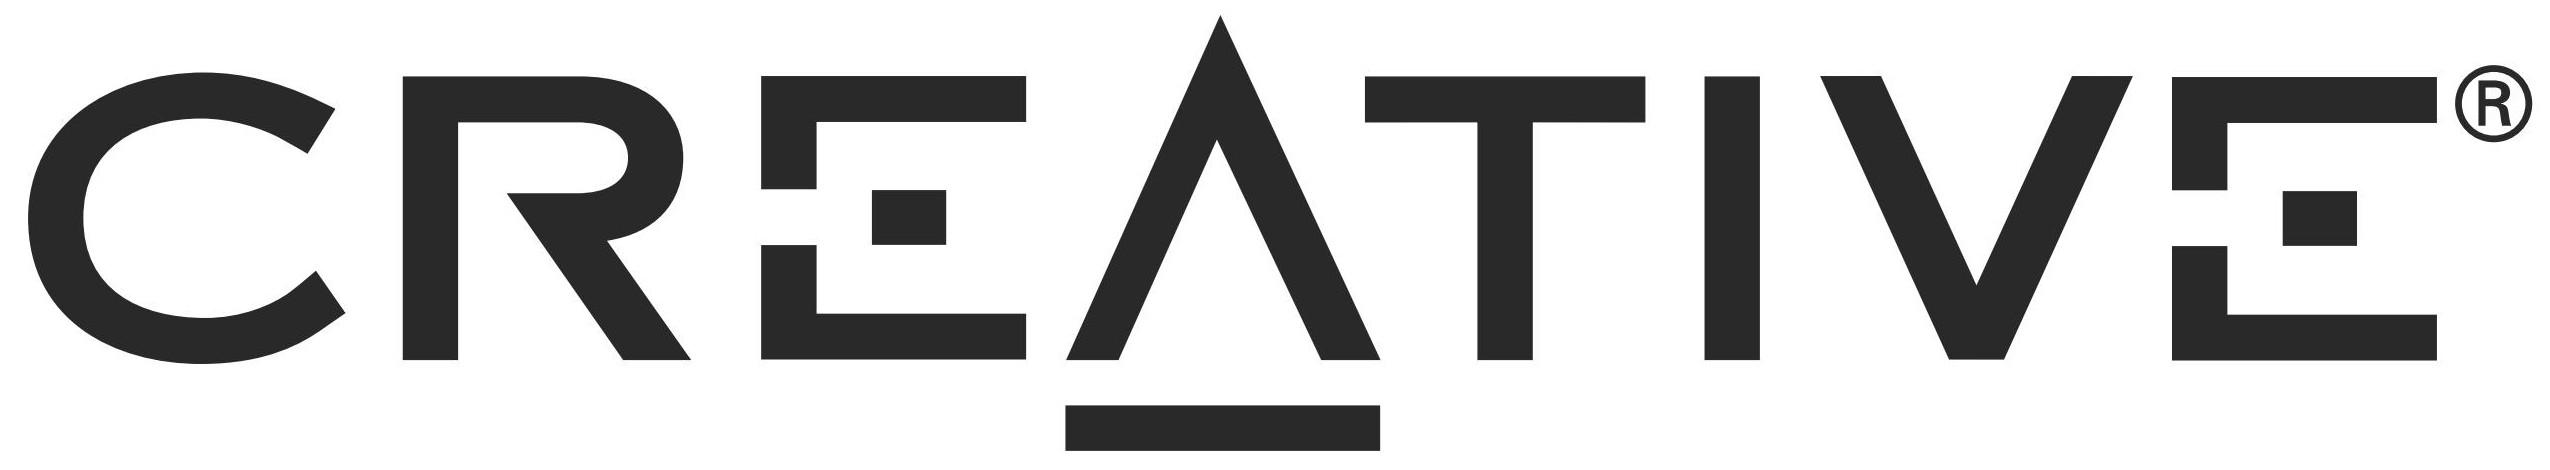 Creative Logo Vector EPS Free Download, Logo, Icons, Brand Emblems